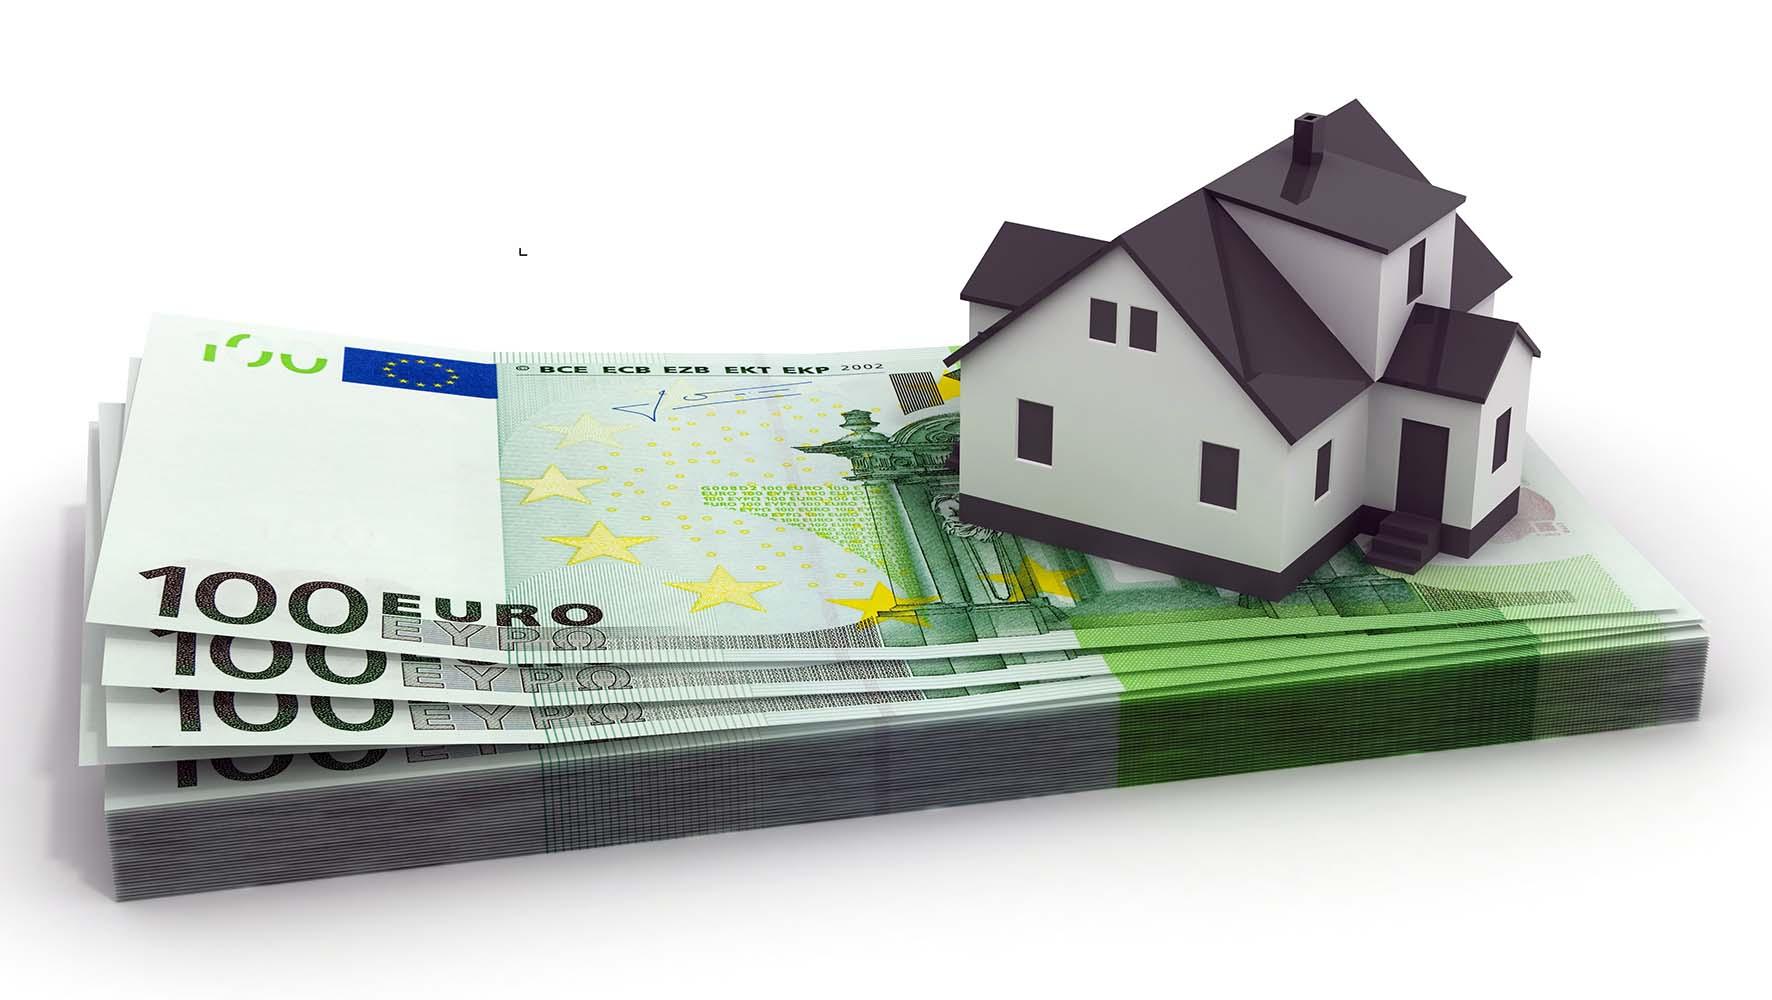 mutuo casa mazzetta 100 euro